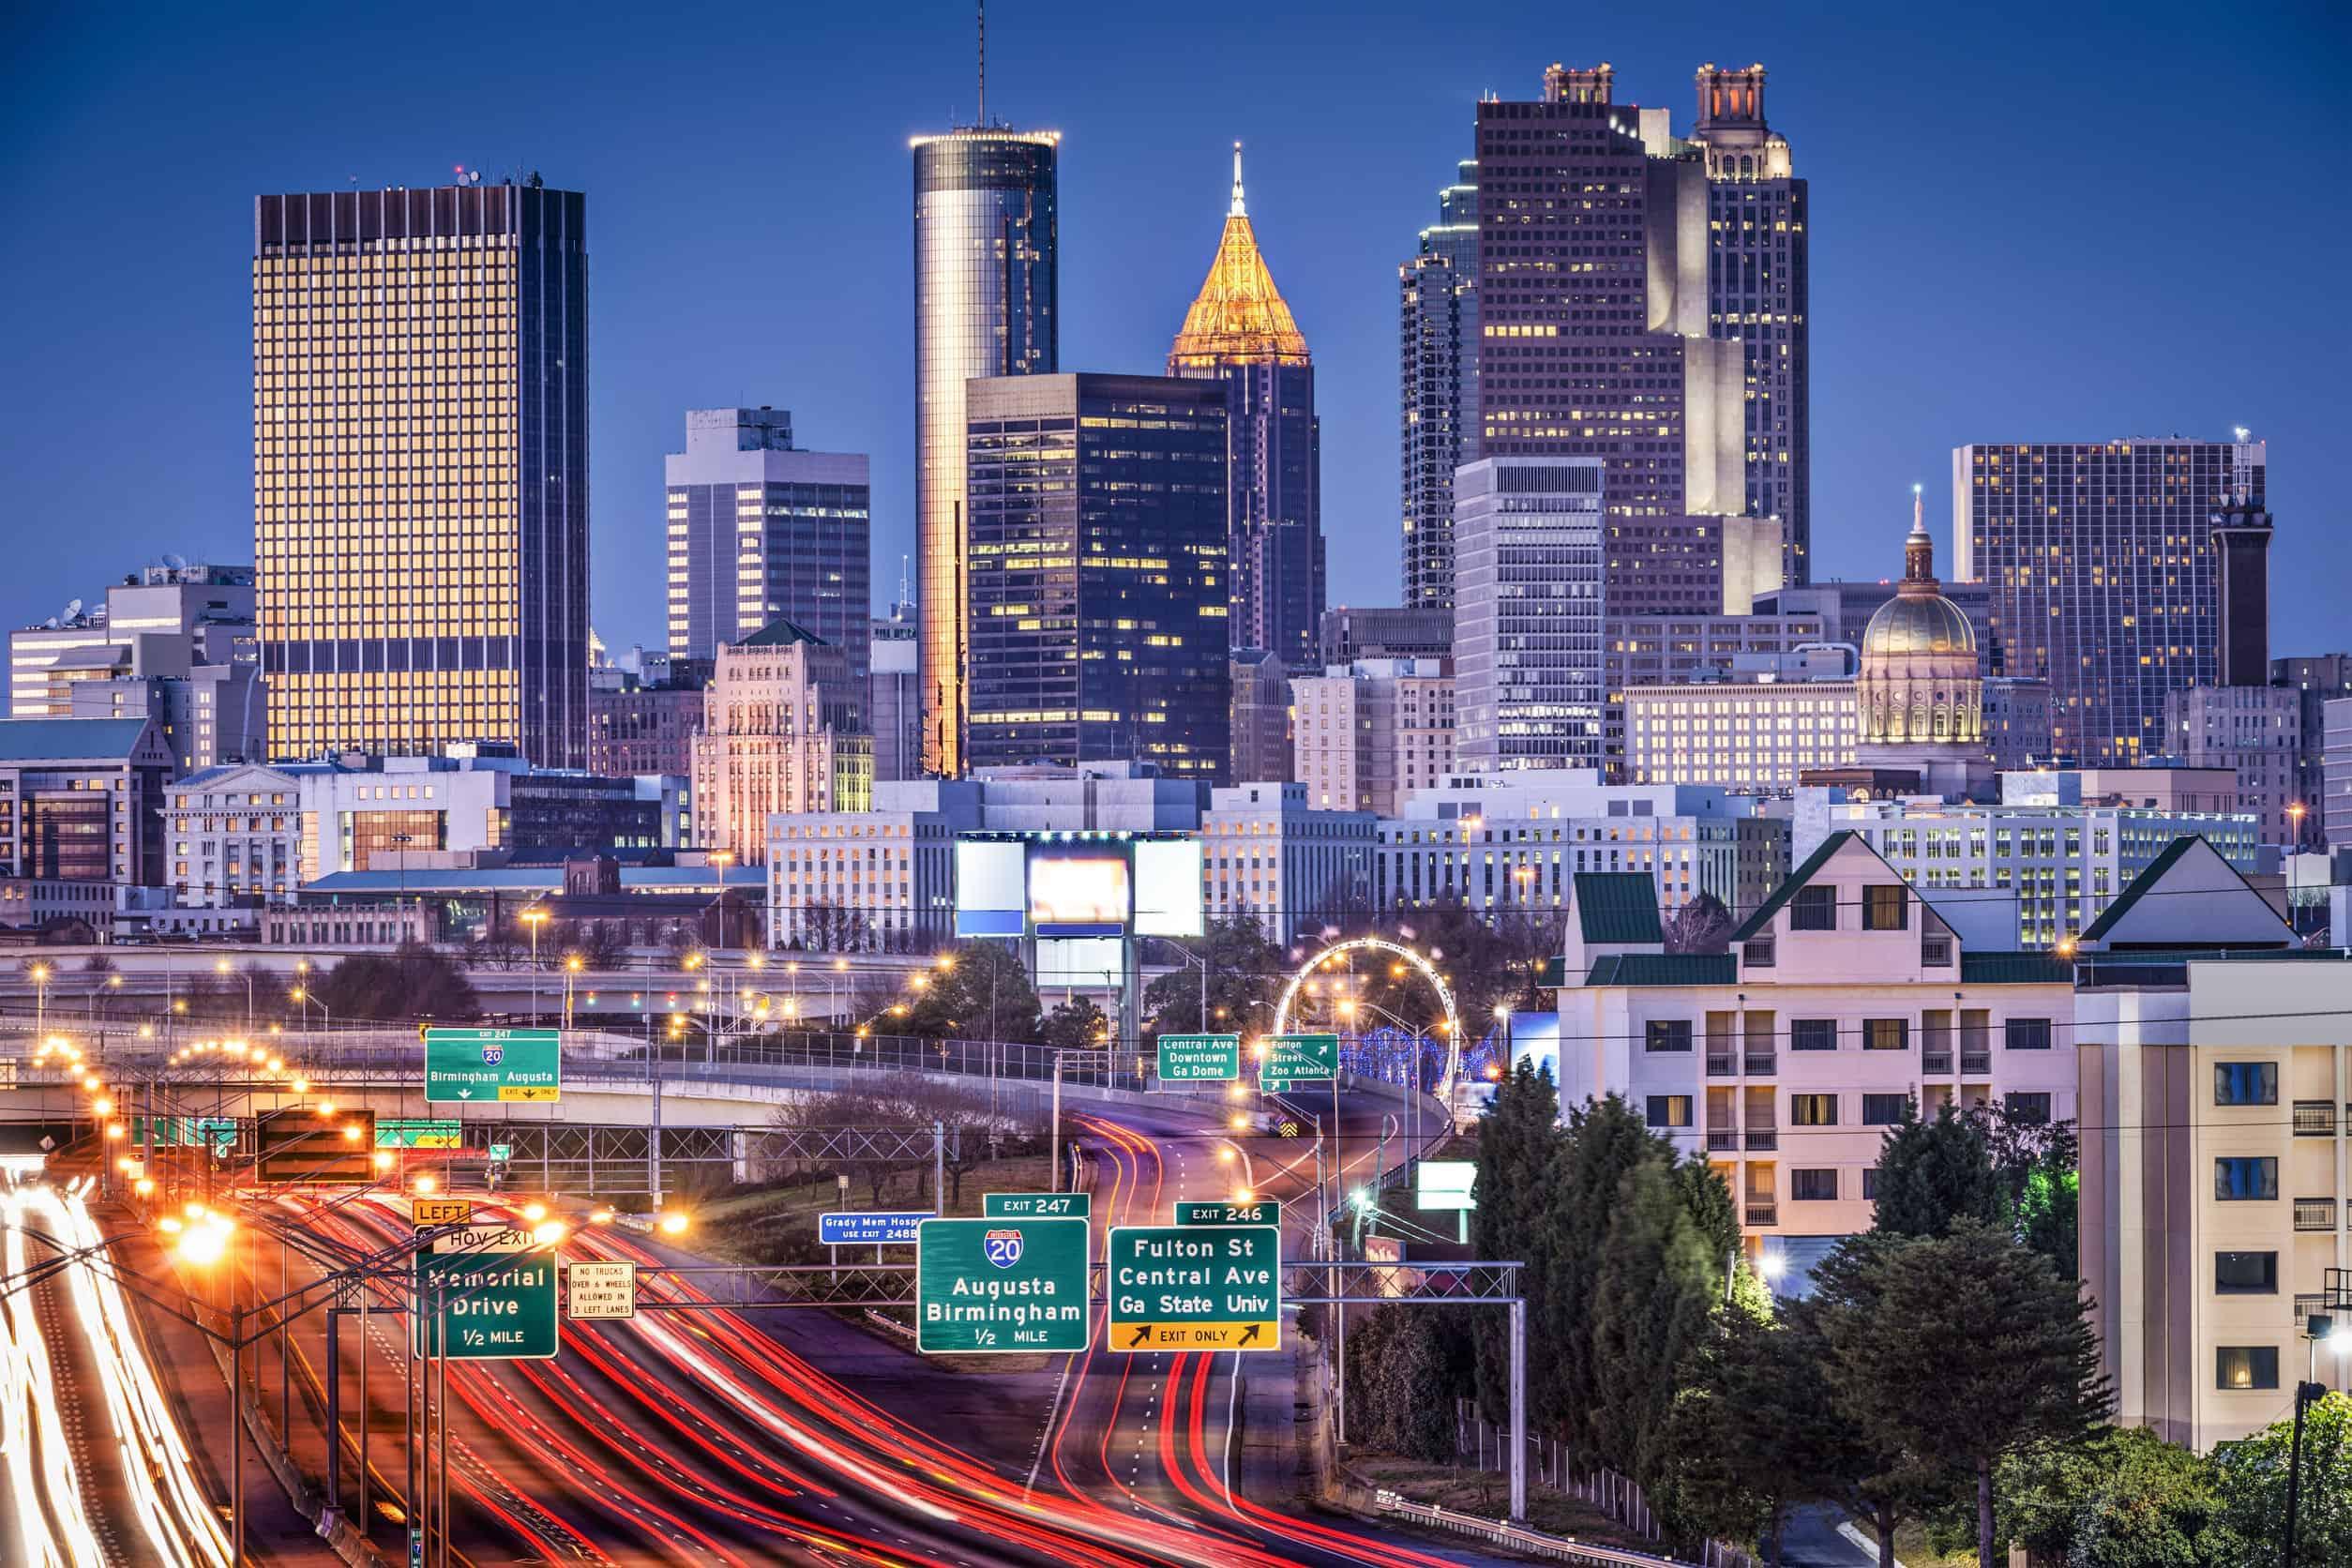 Atlanta ransomware attack